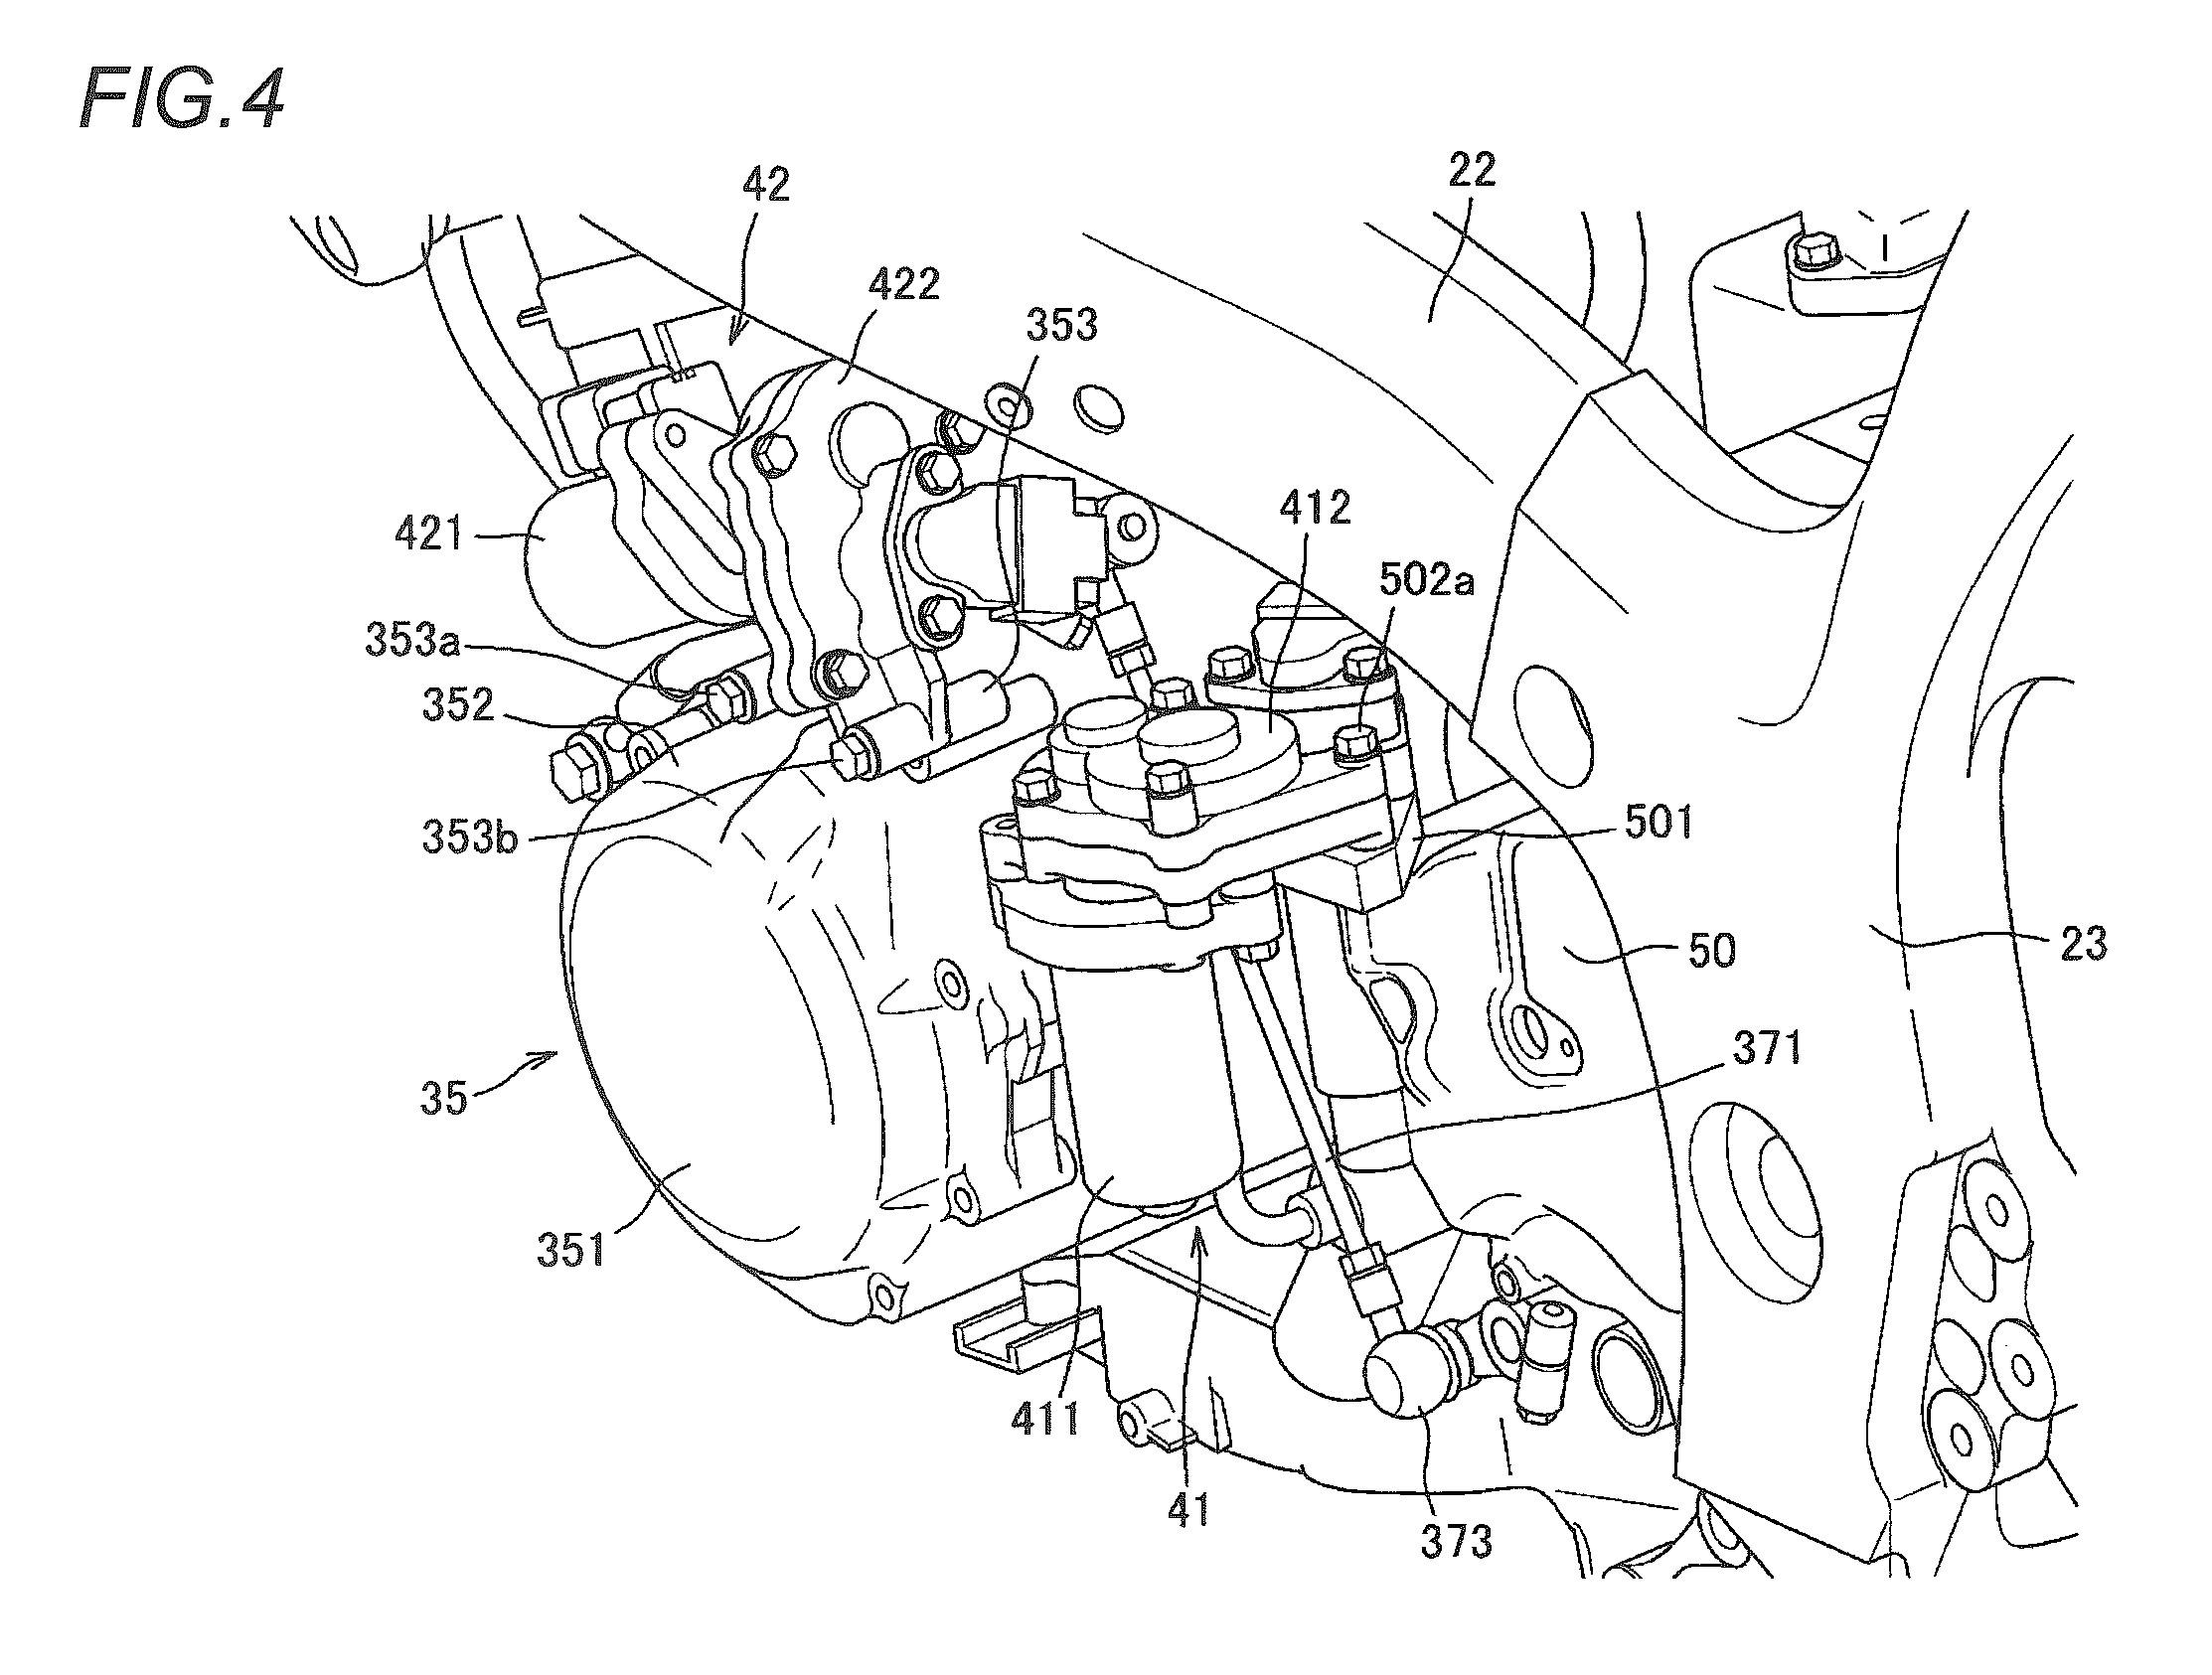 Motorcycle Transmission Diagram Suzuki Hayaubsa Semi Automatic Transmission Patents Motorcycle Of Motorcycle Transmission Diagram